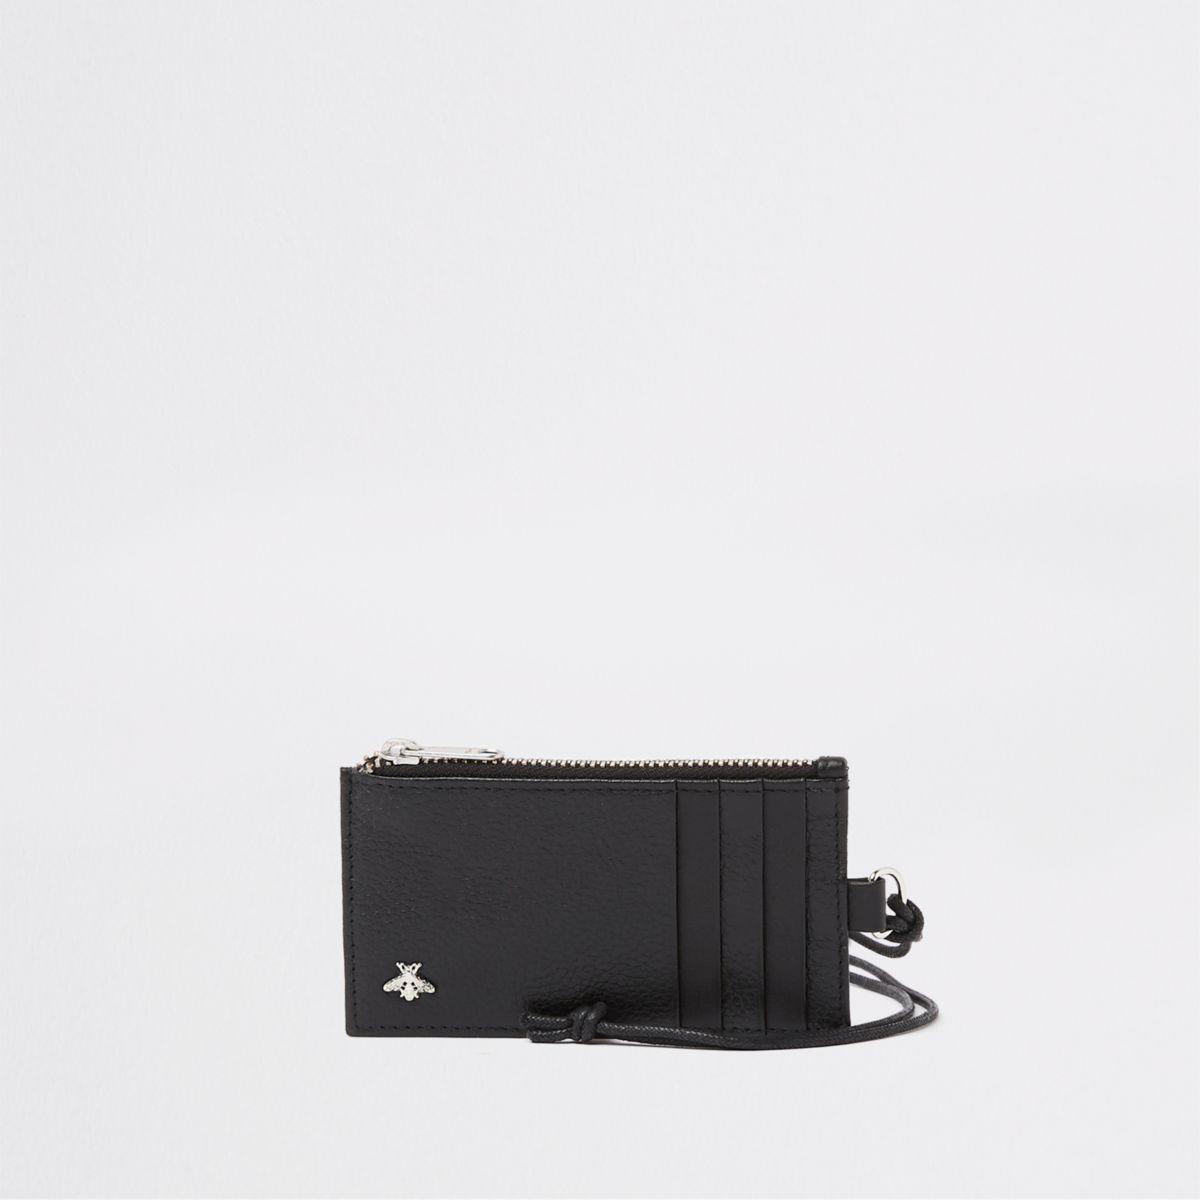 Black leather lanyard card holder